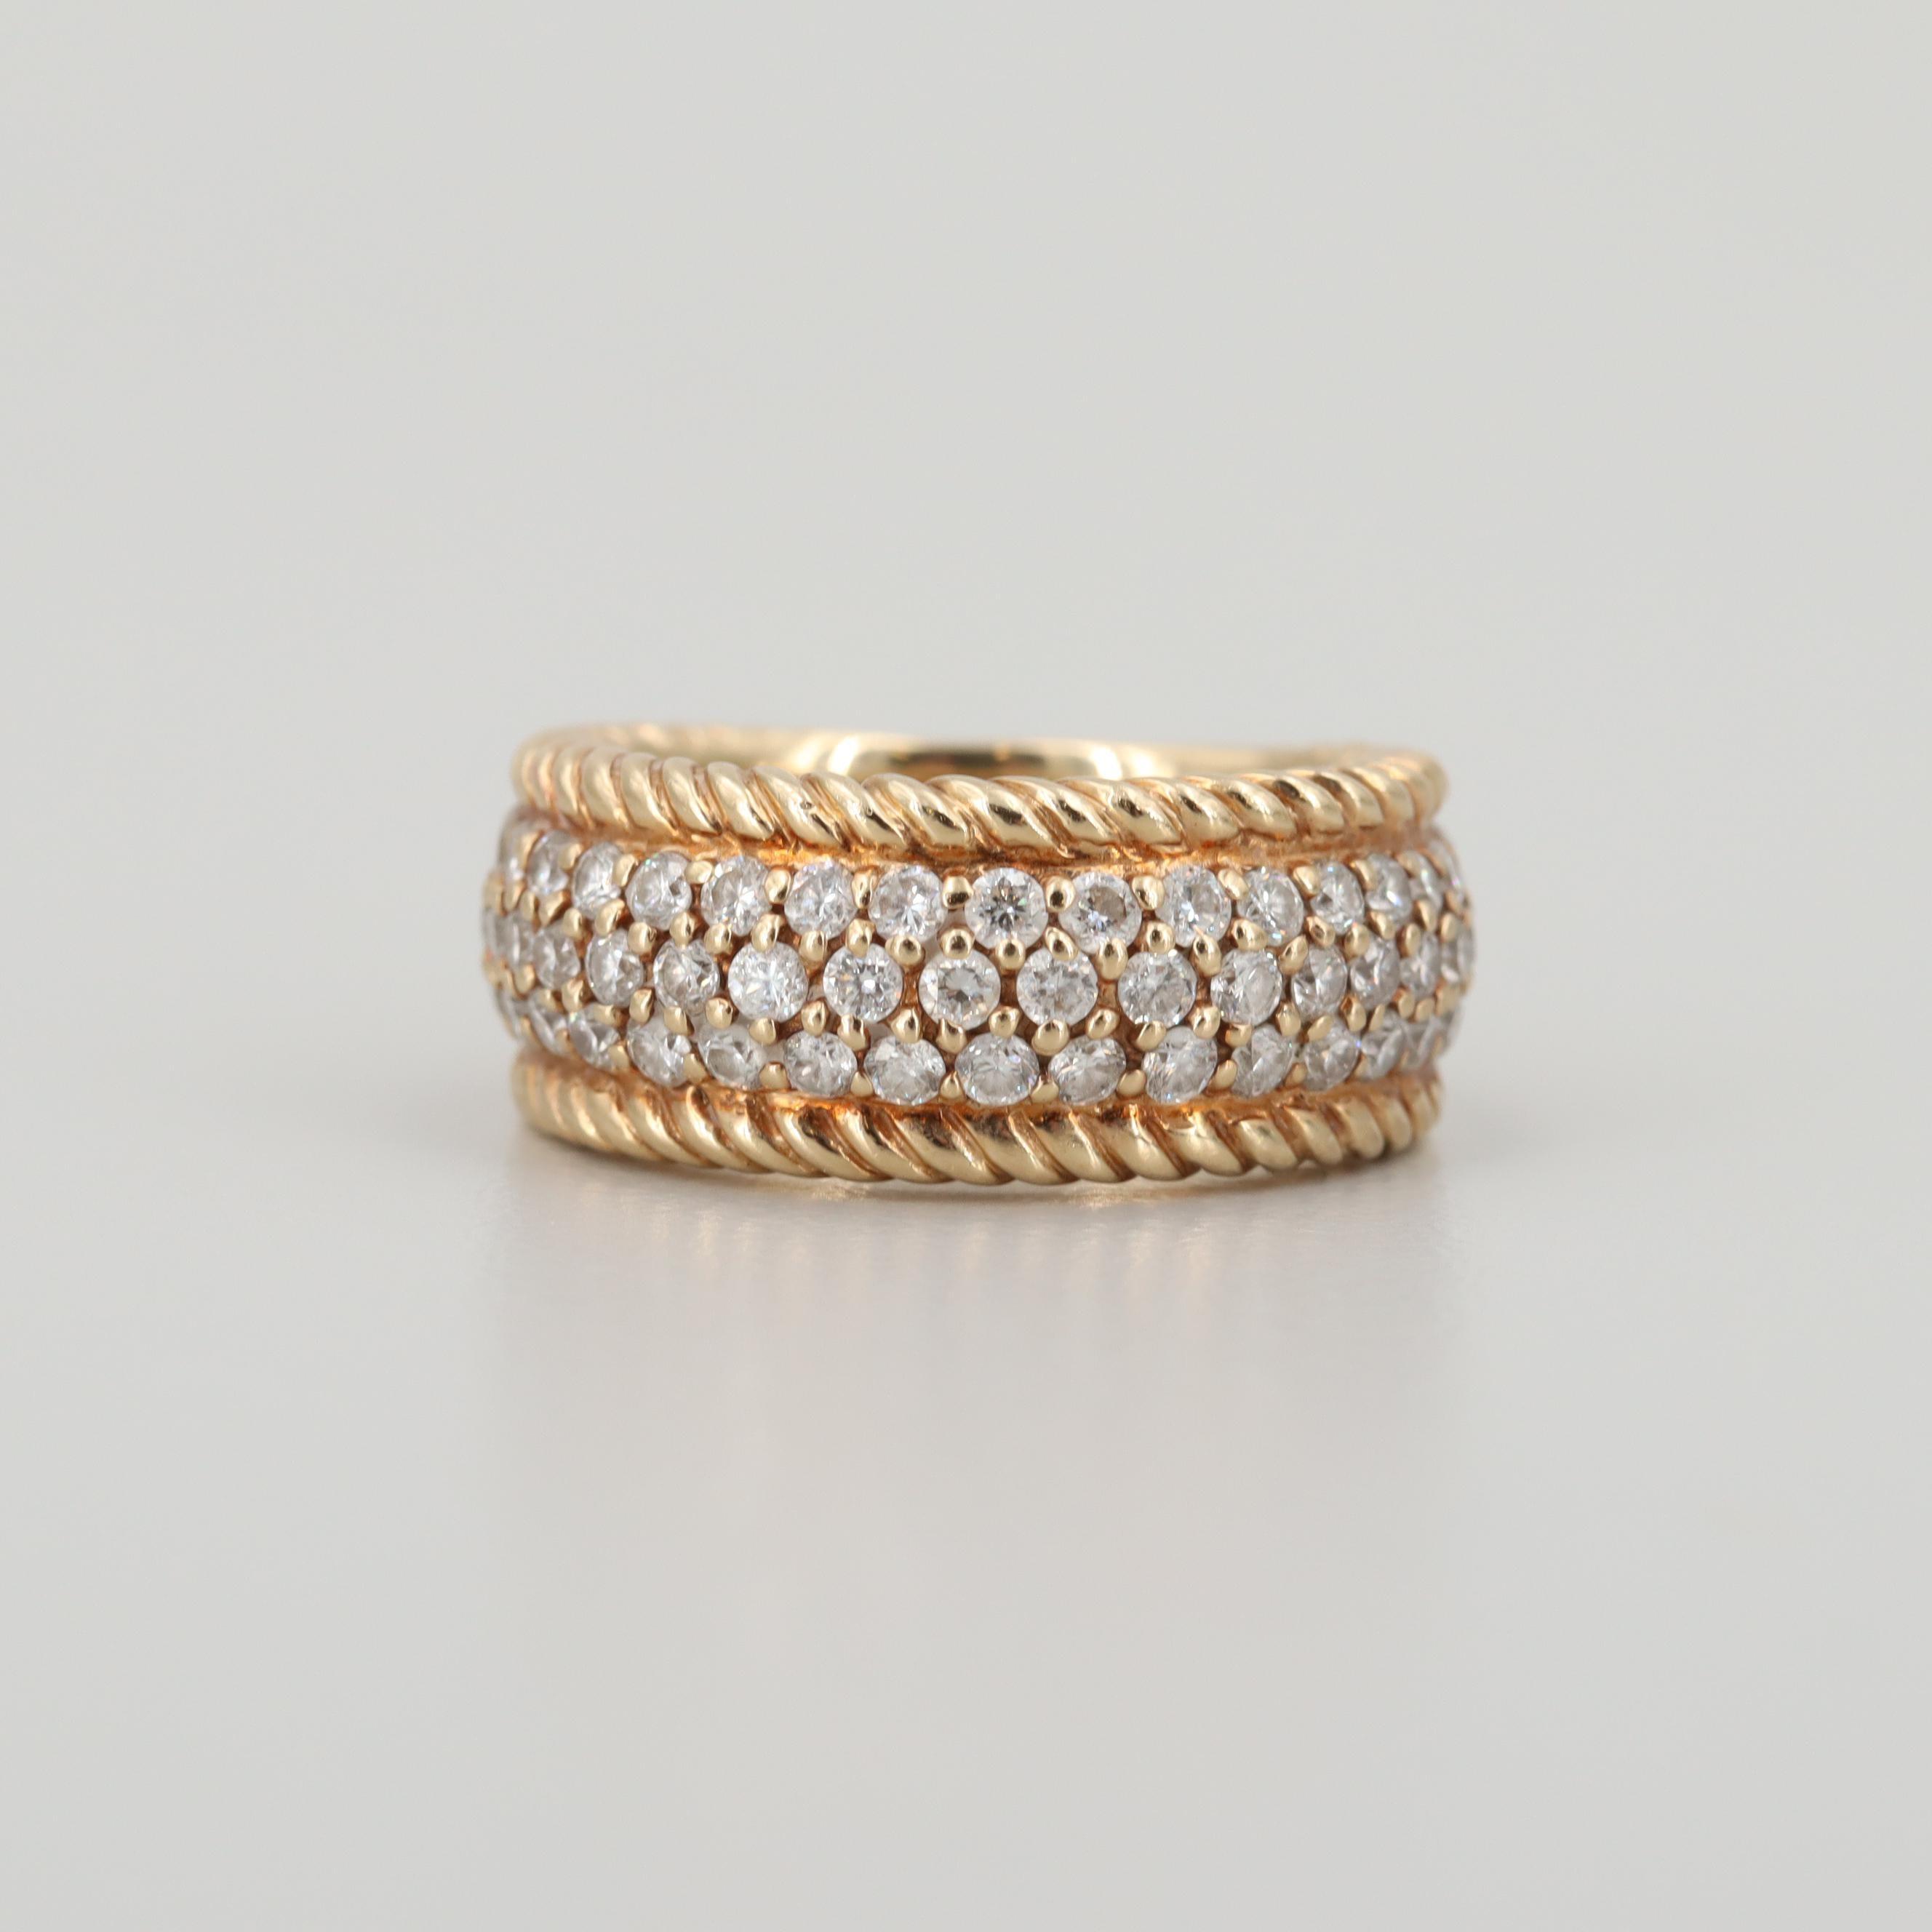 Sonia B. 14K Yellow Gold 1.52 CTW Diamond Ring